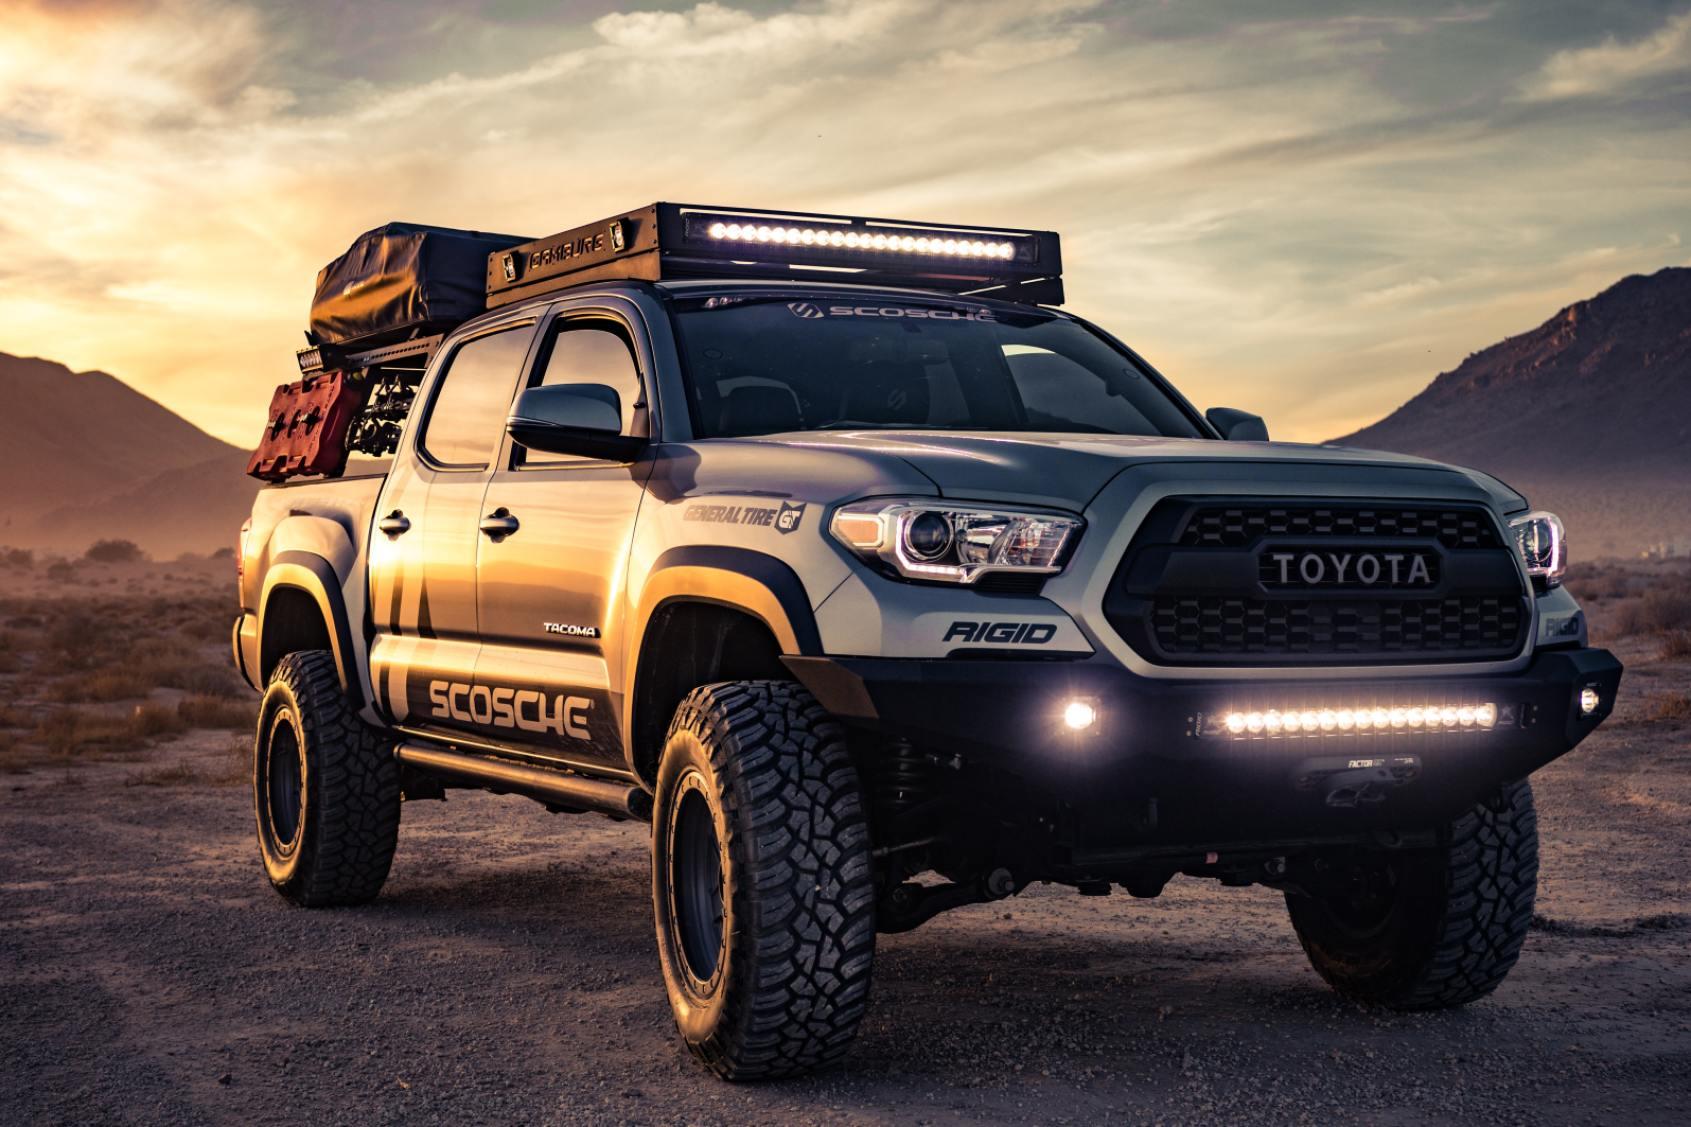 Toyota Truck - Original image